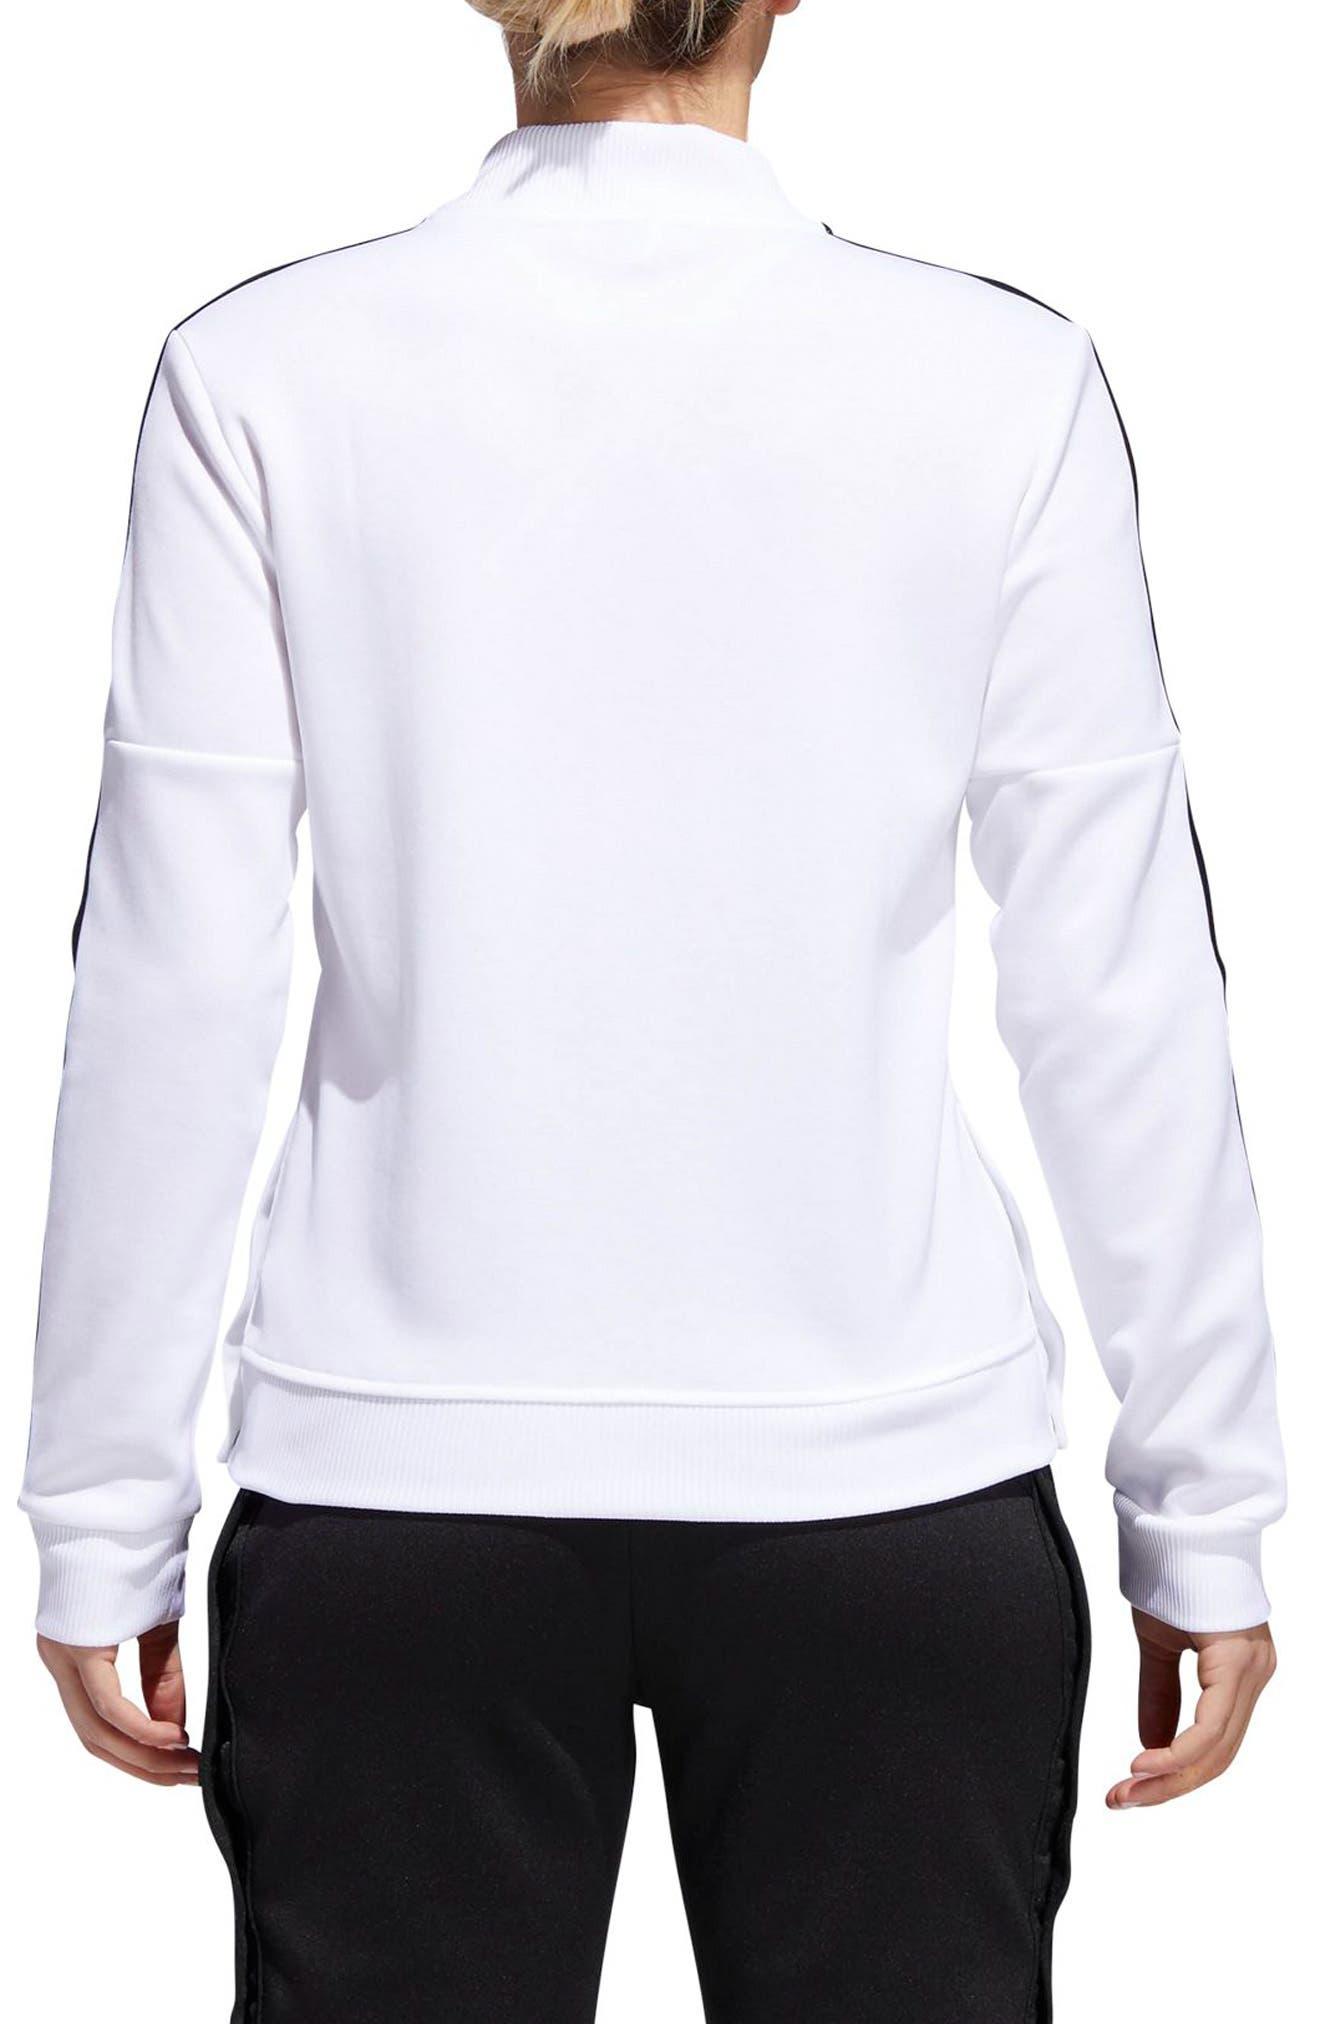 Tricot Snap It Track Jacket,                             Alternate thumbnail 2, color,                             White/ Black